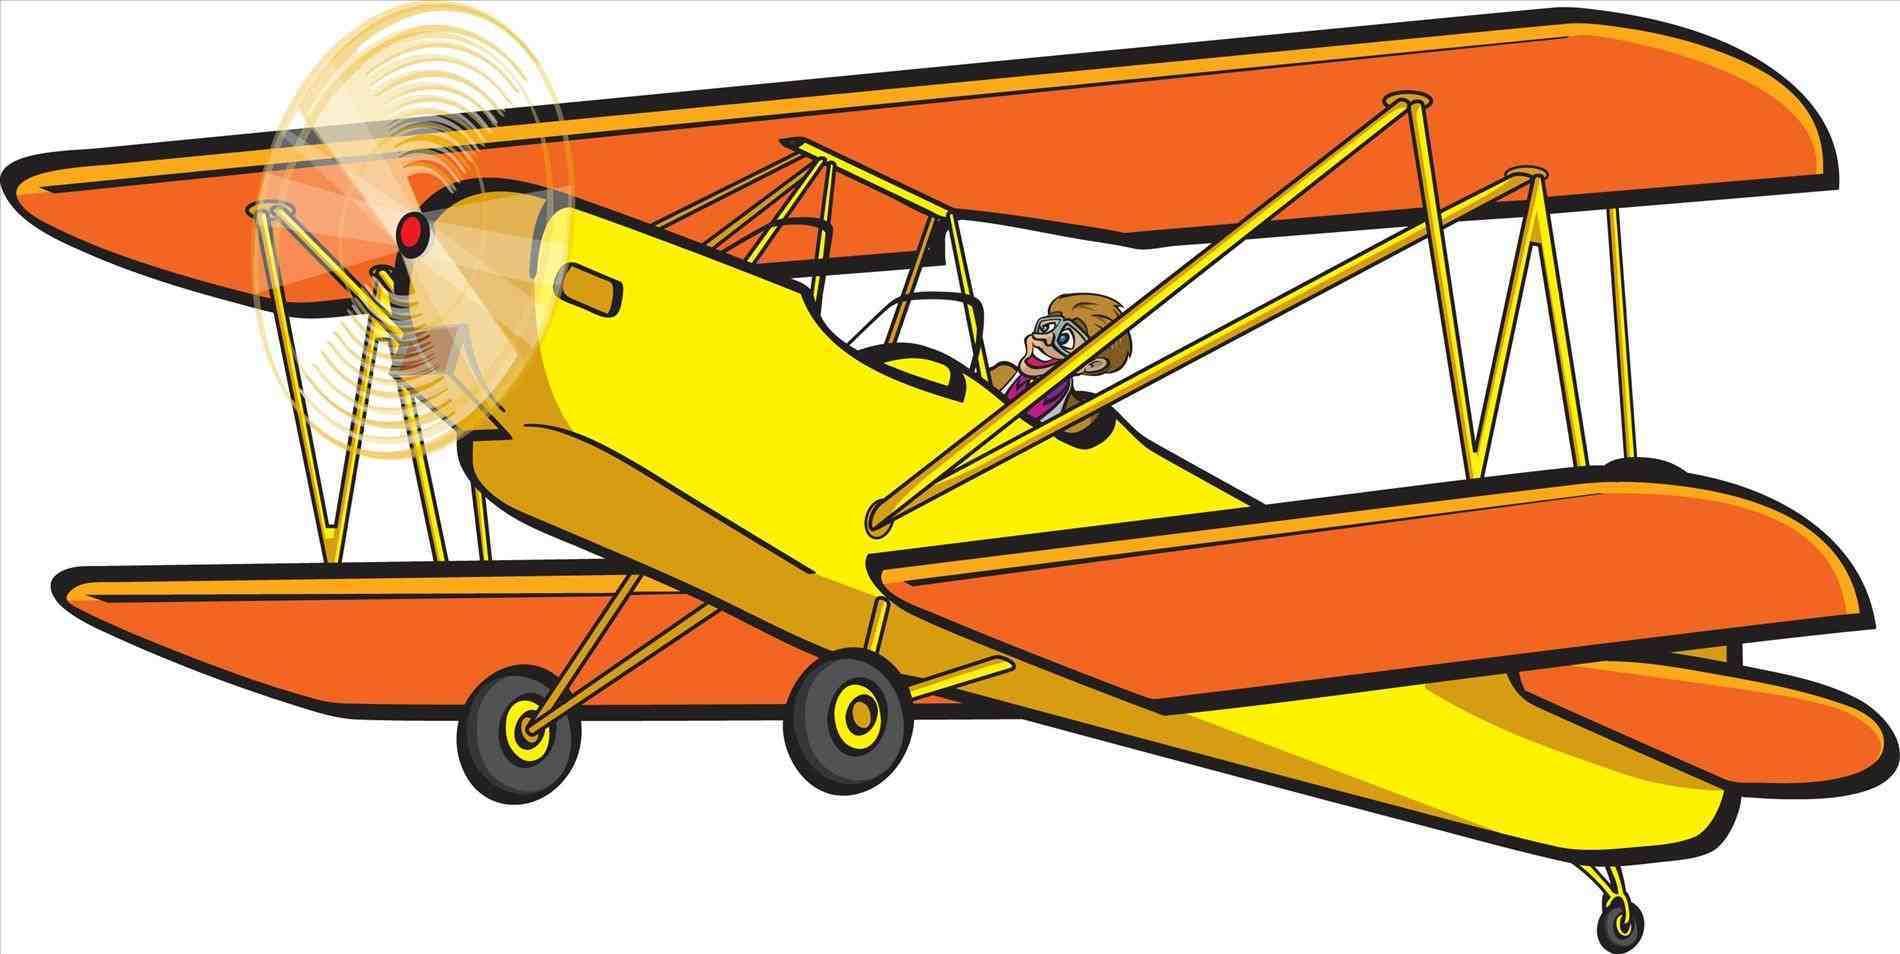 1900x954 Toy Plane Libraryrhhdriblogcom Rhopenorg Rhopenorg First Airplane